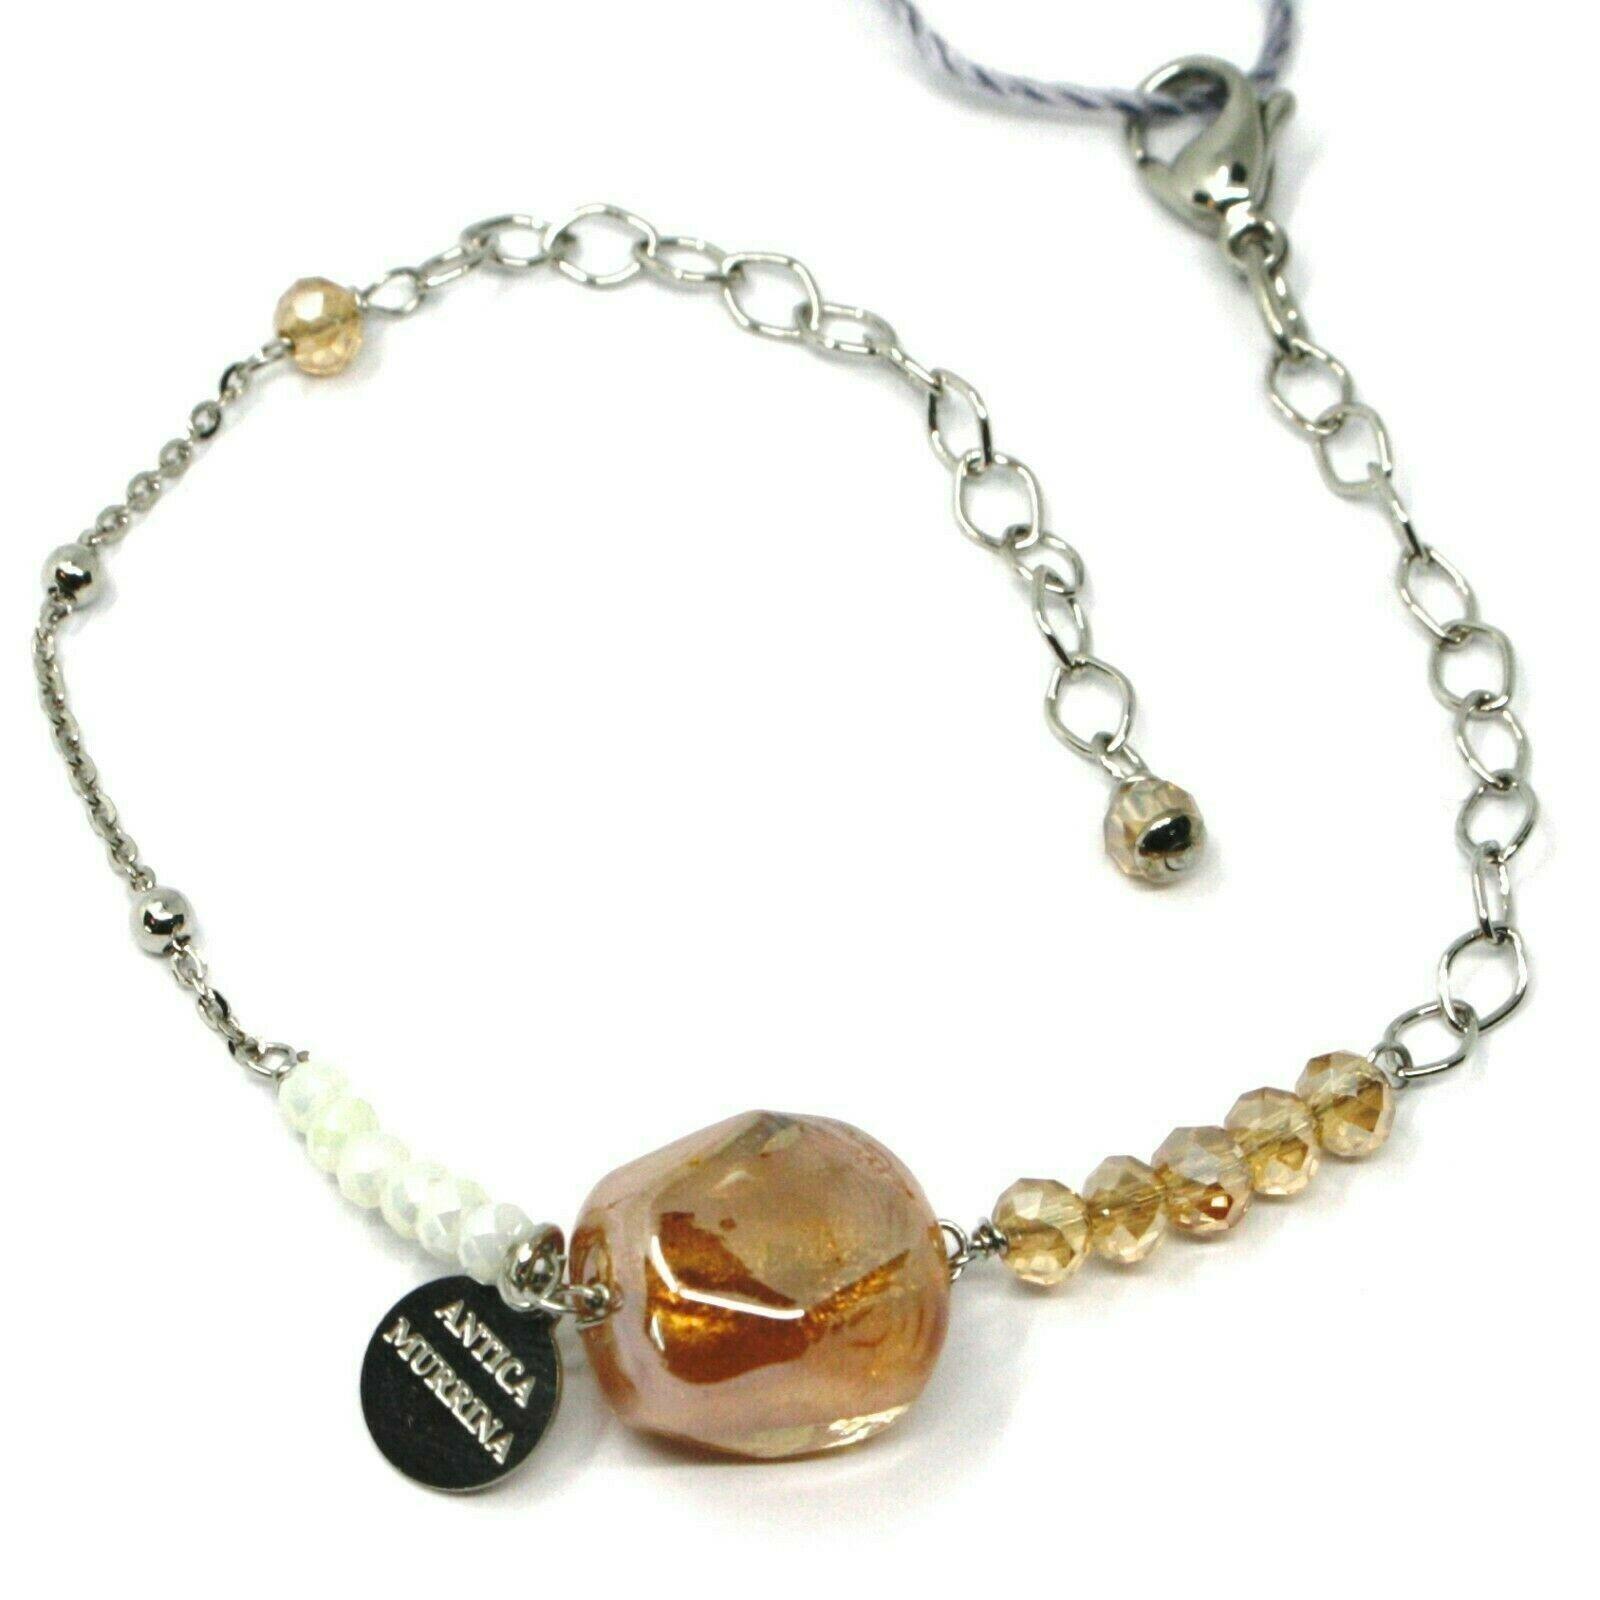 Bracelet Antica Murrina Venezia,BR774A10,Nugget Orange,Colour Amber